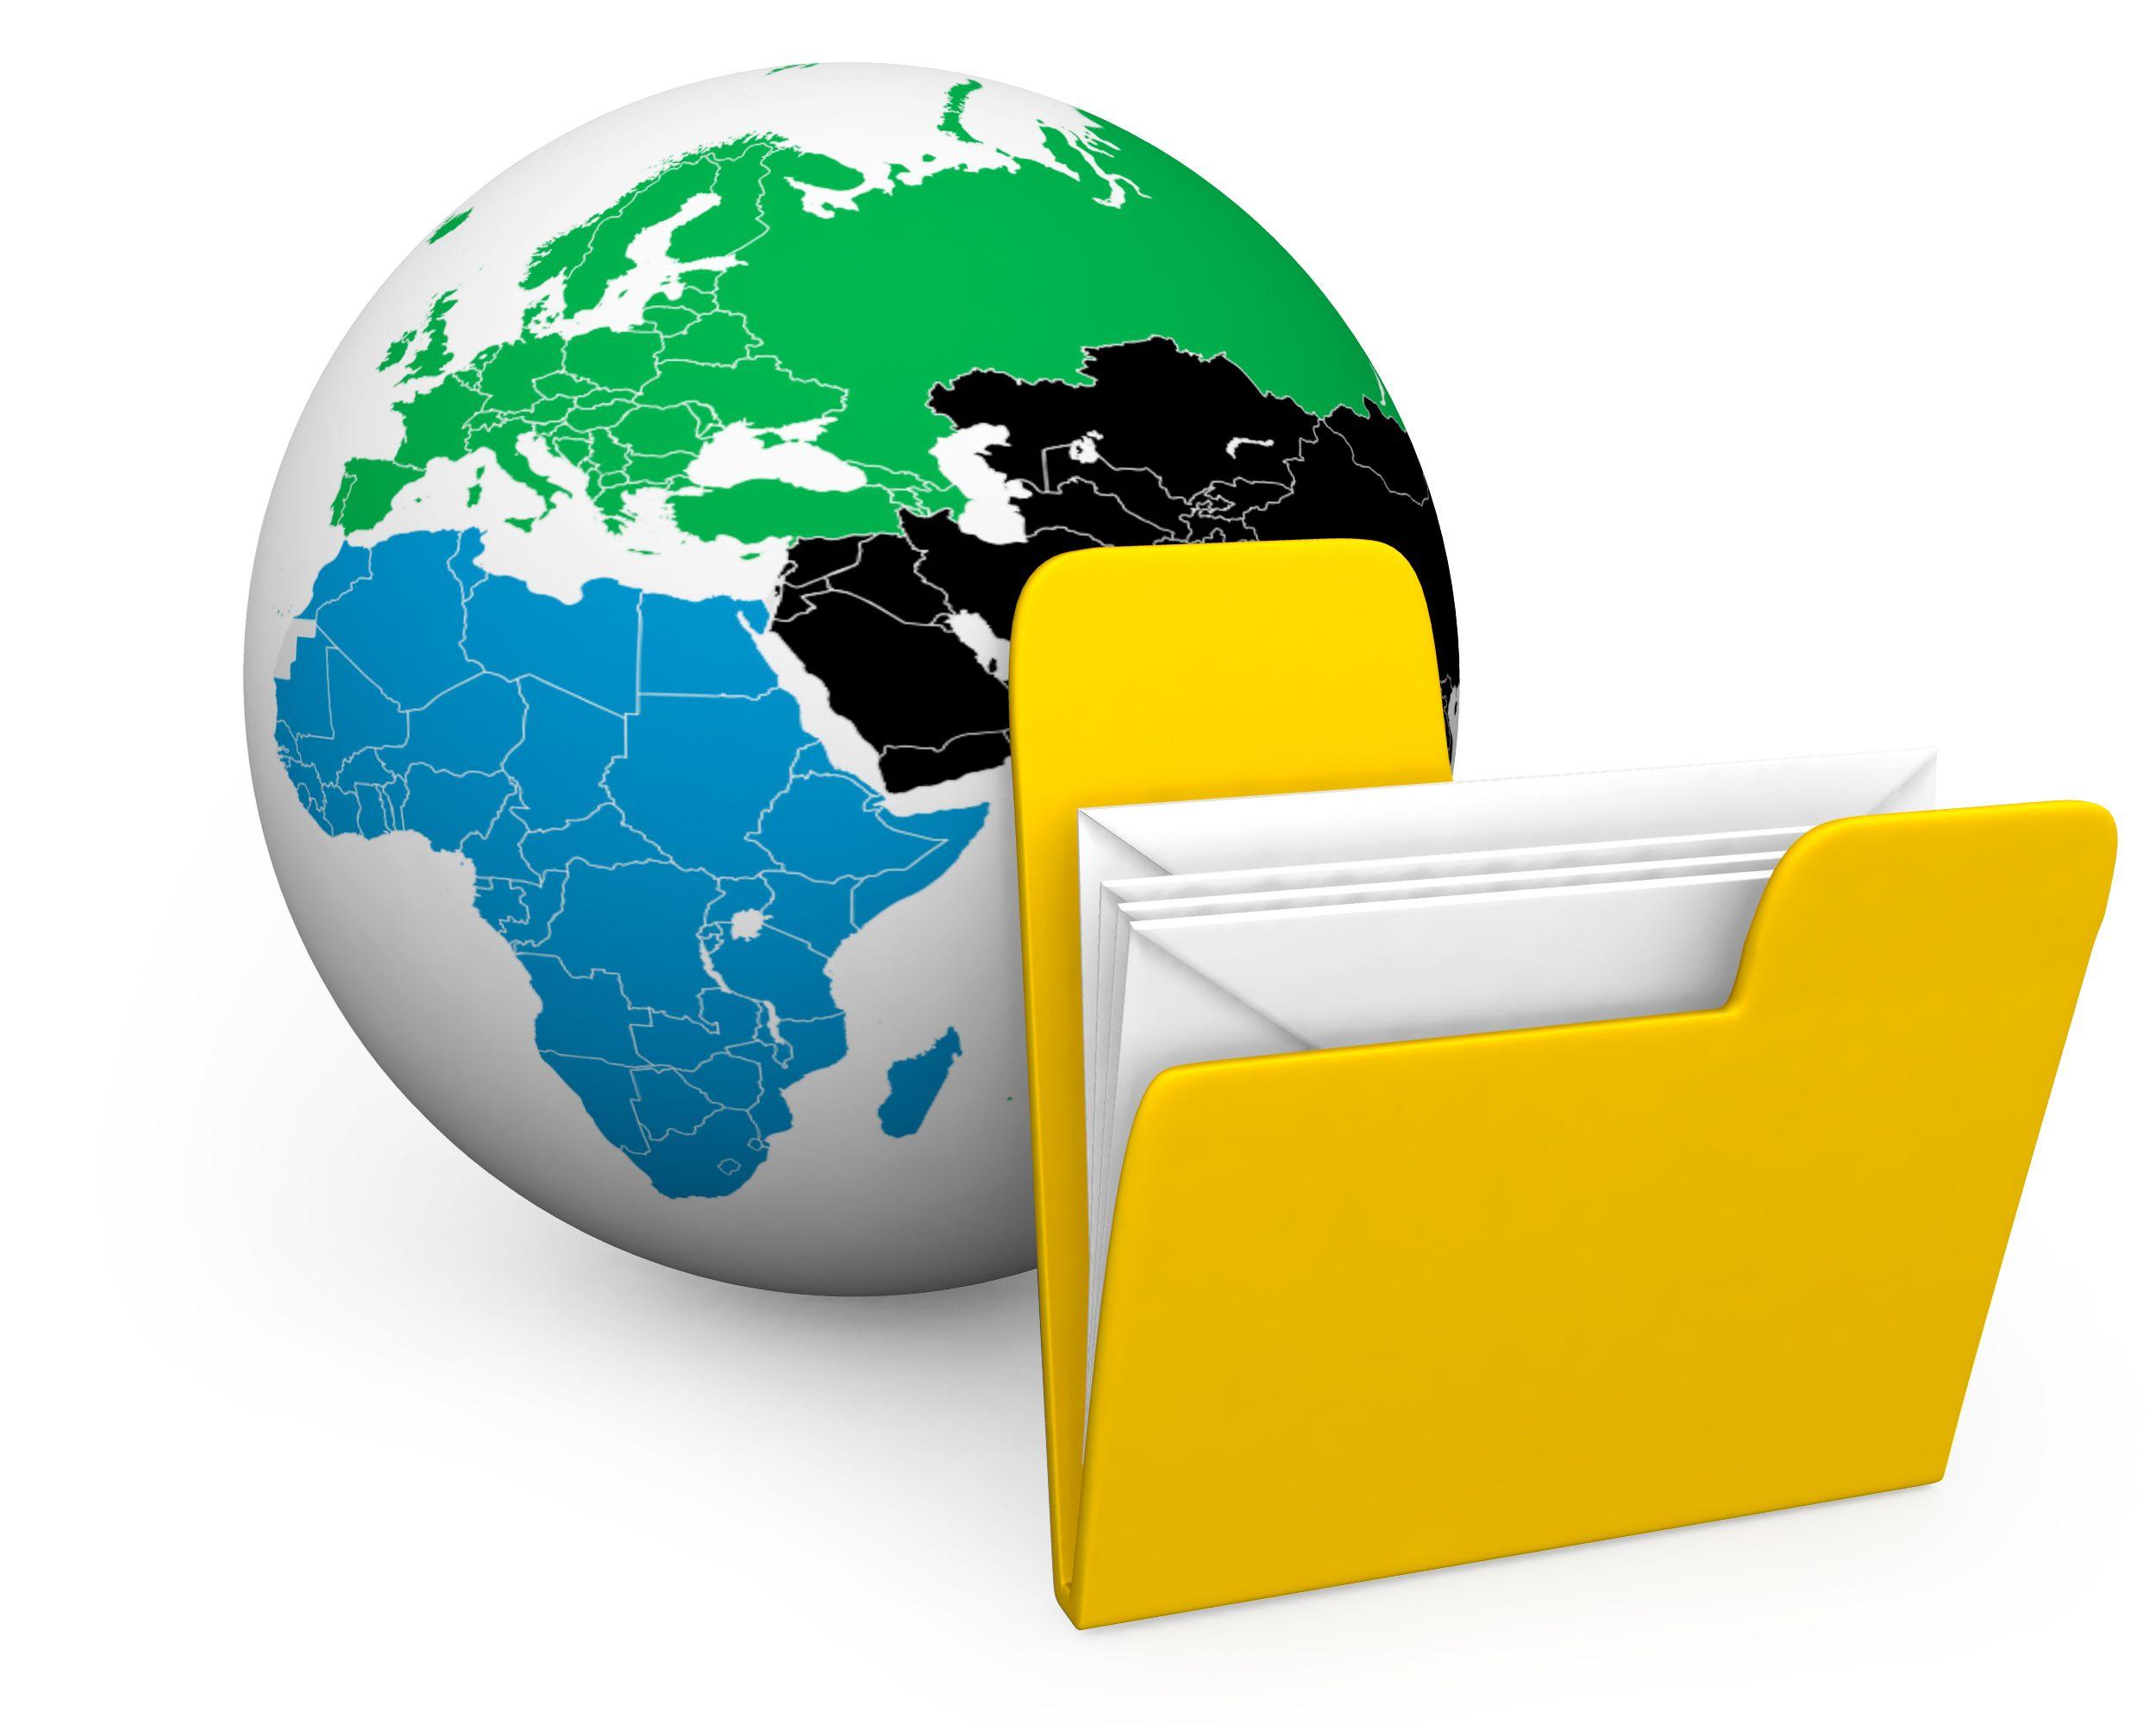 yellow_folder_with_white_envelopes_to_show_global_data_stock_photo_Slide01